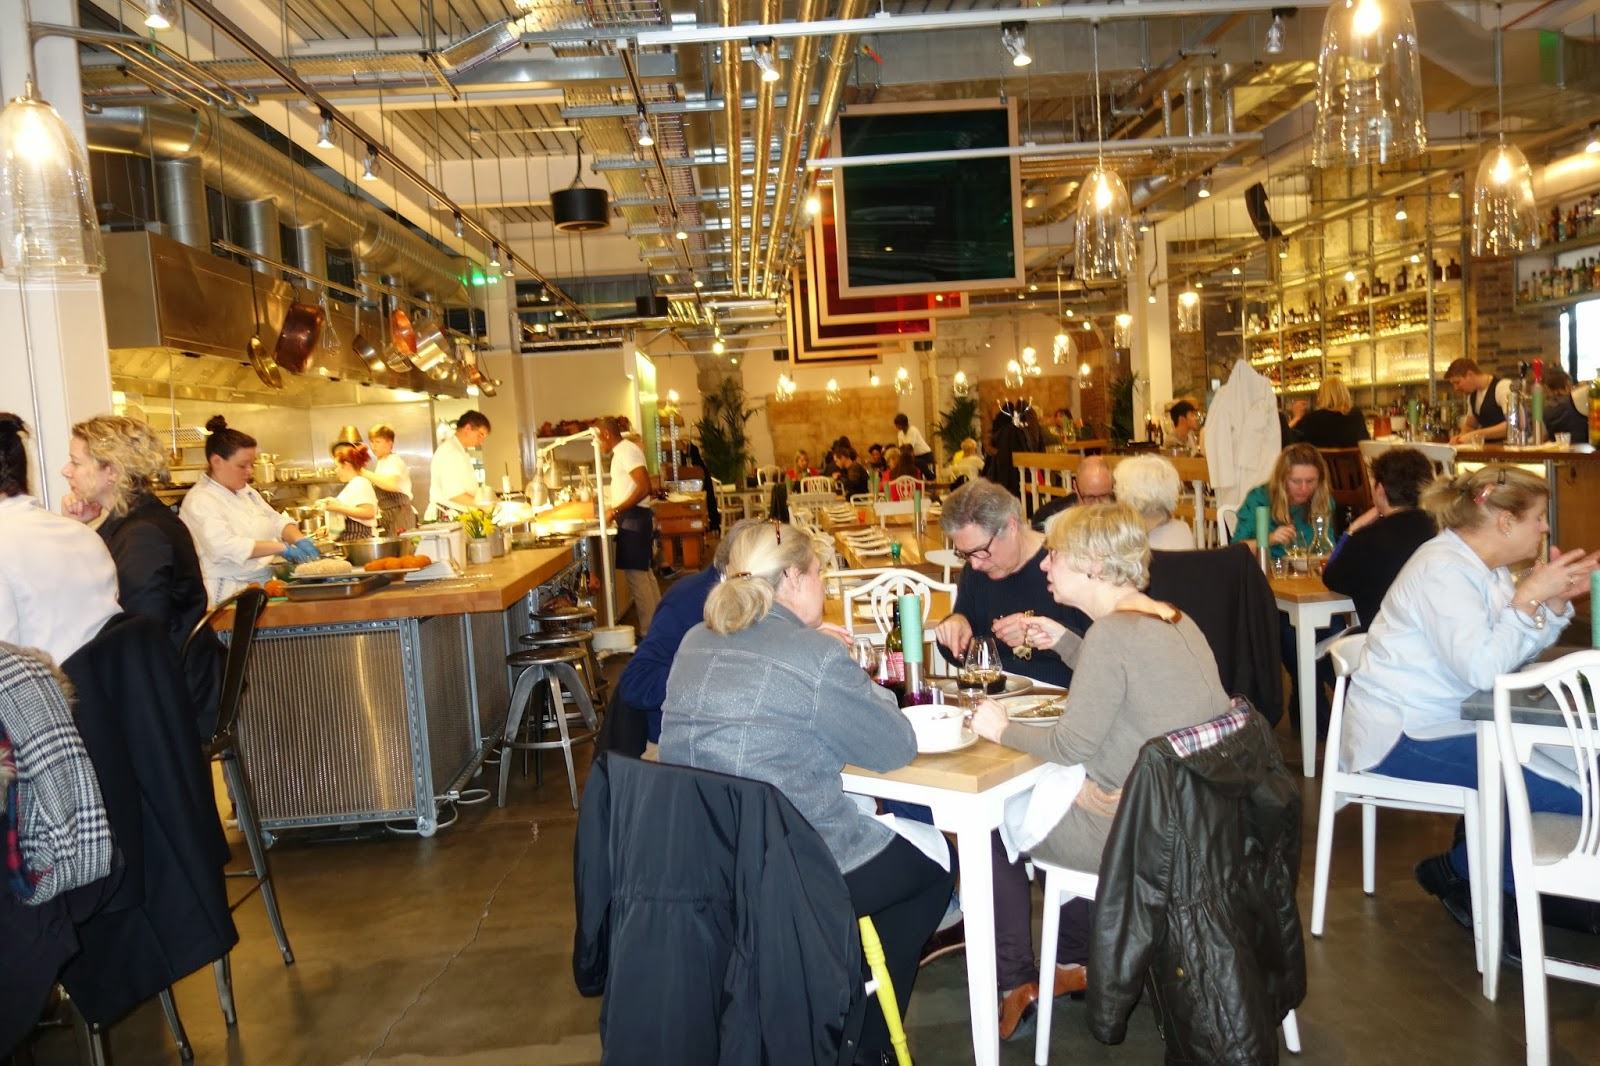 The interior of Grain store restaurant